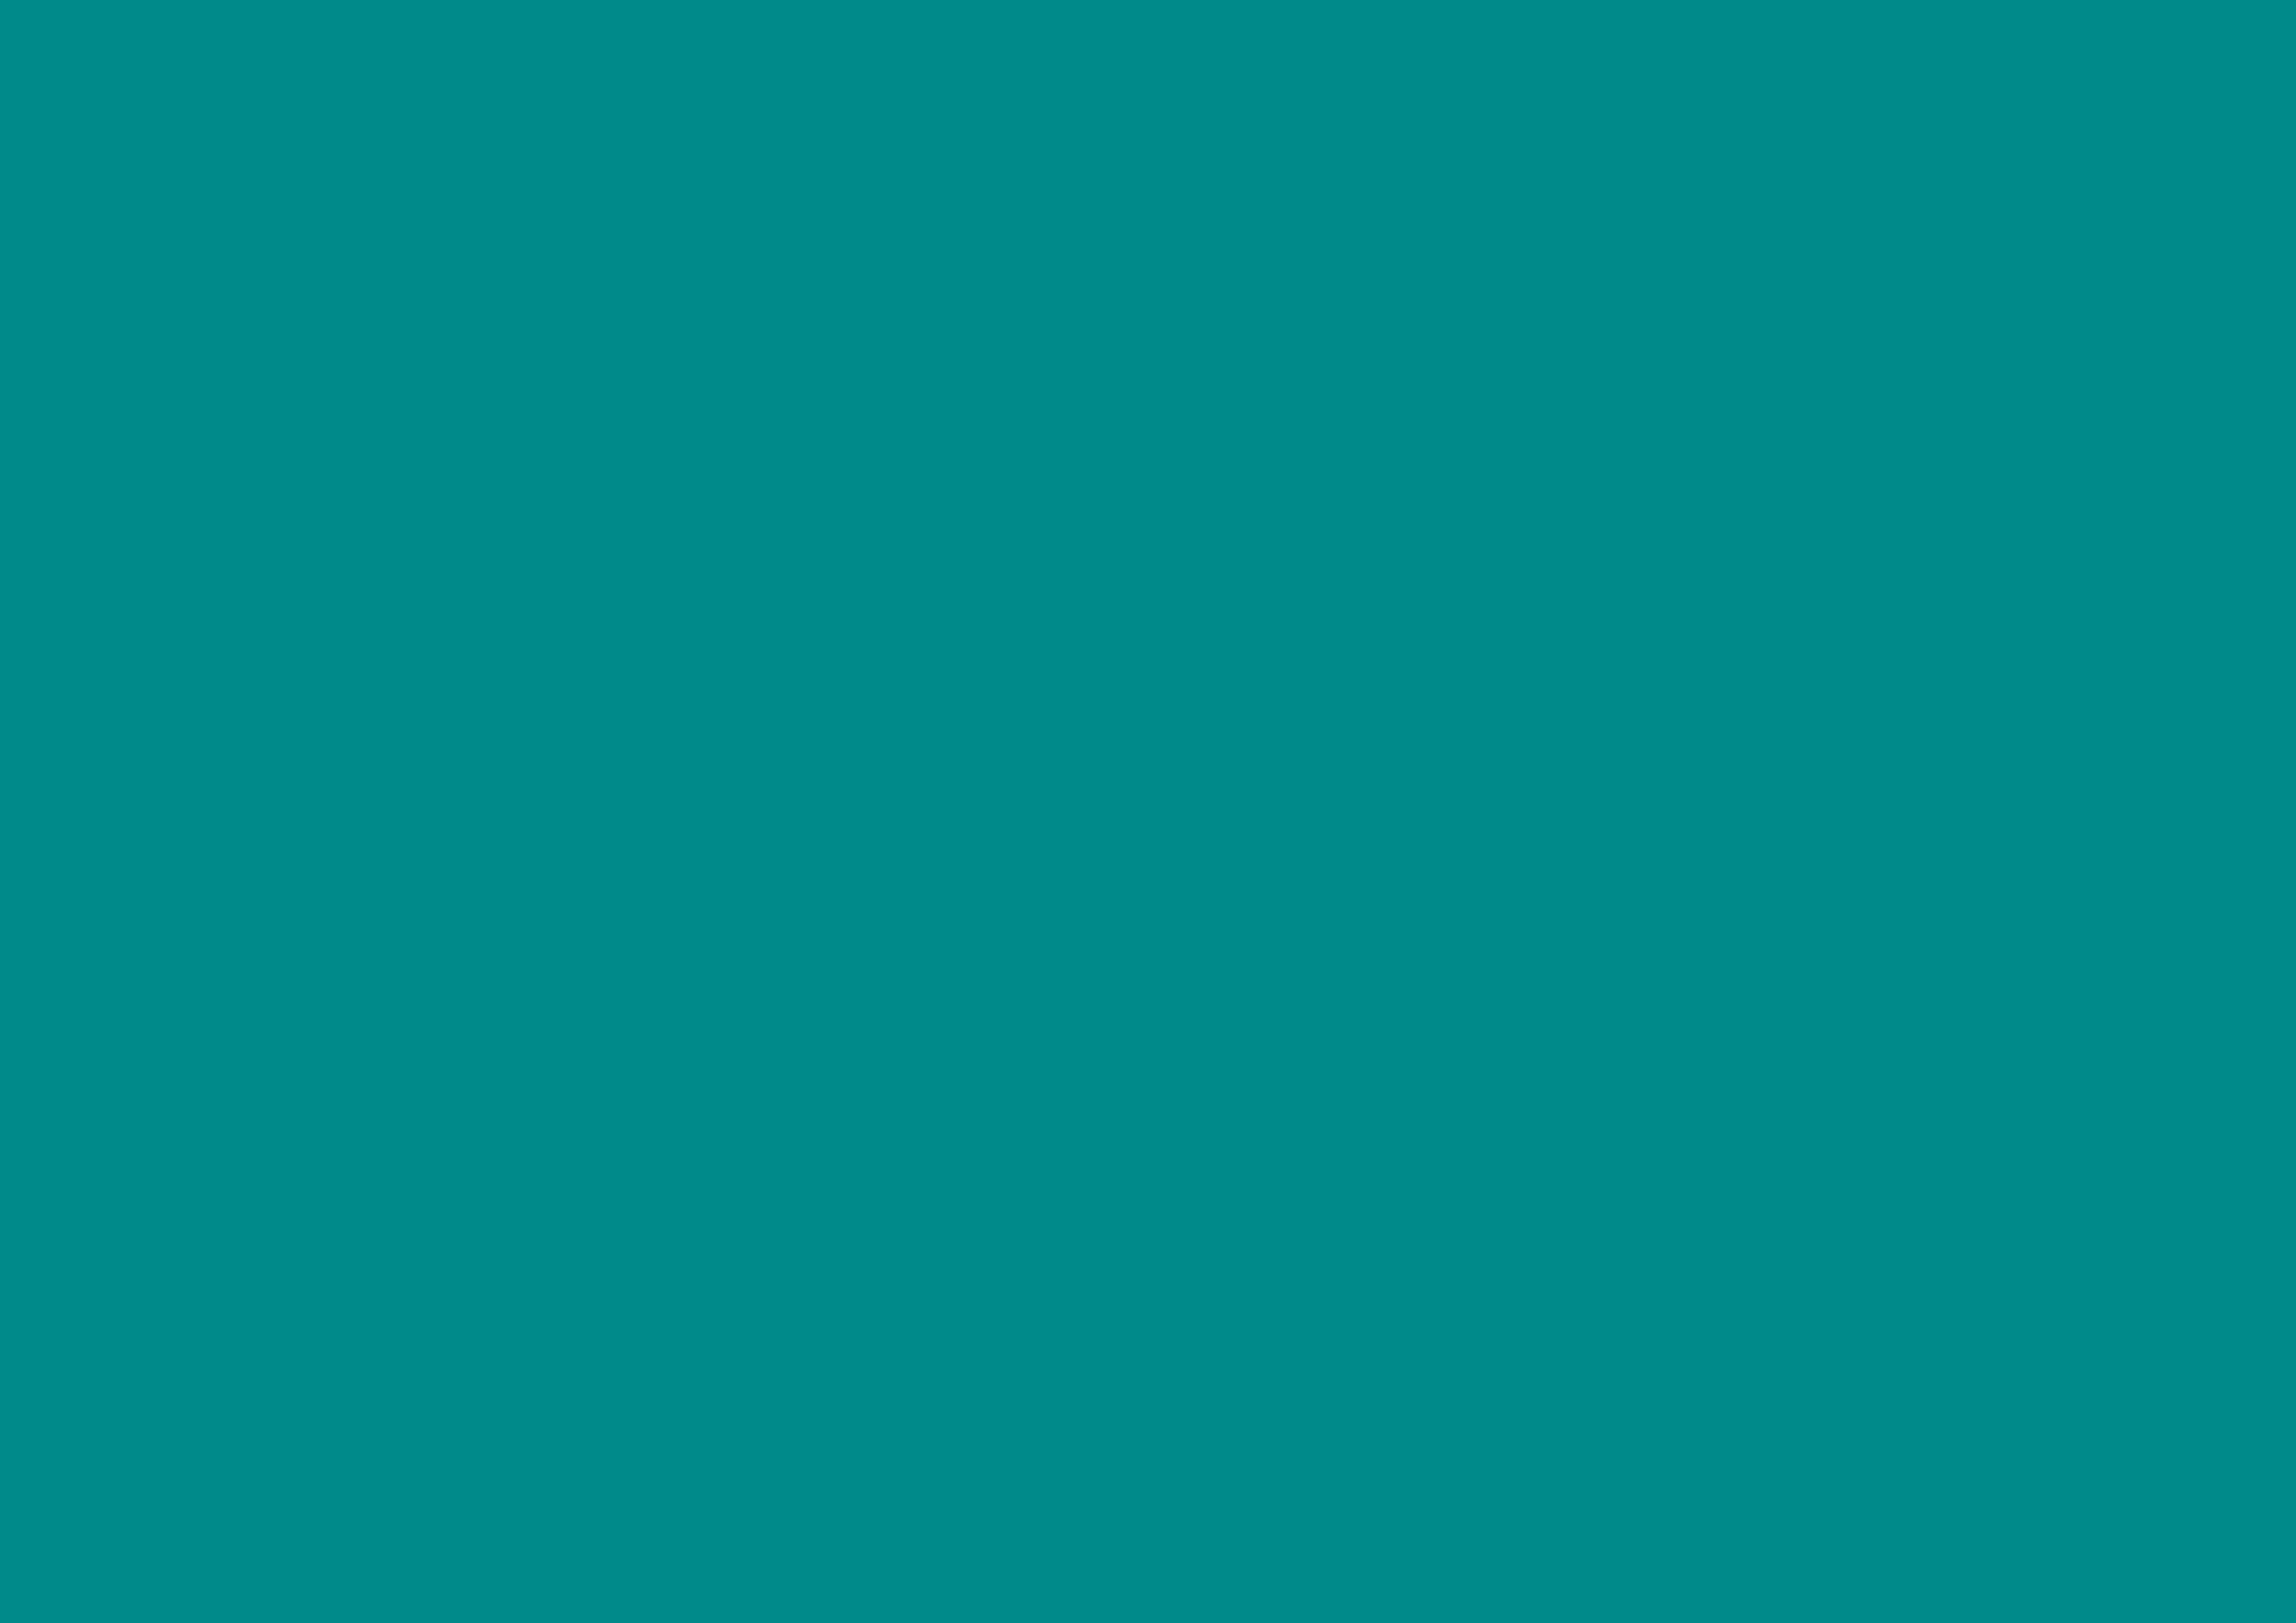 3508x2480 Dark Cyan Solid Color Background